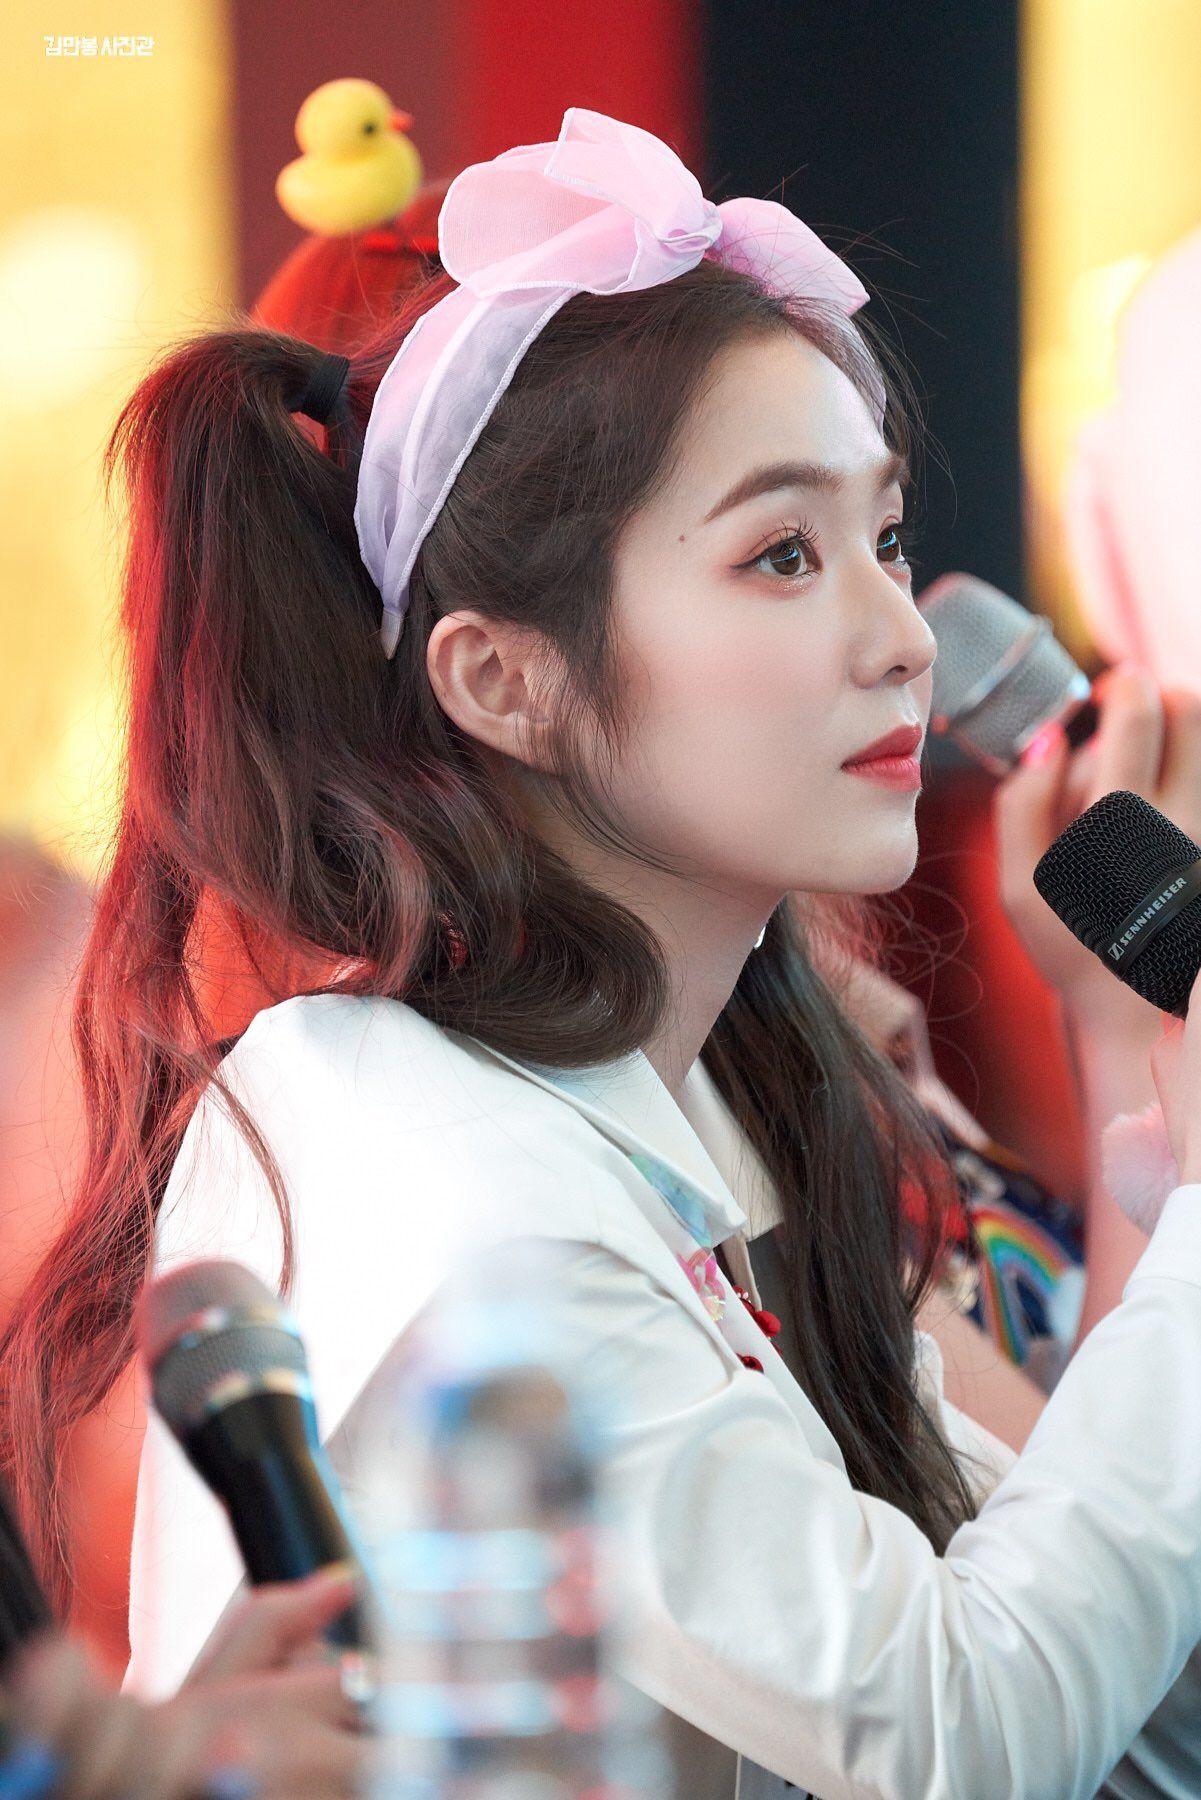 Irene kpop kdrama bts exo kpoparmy